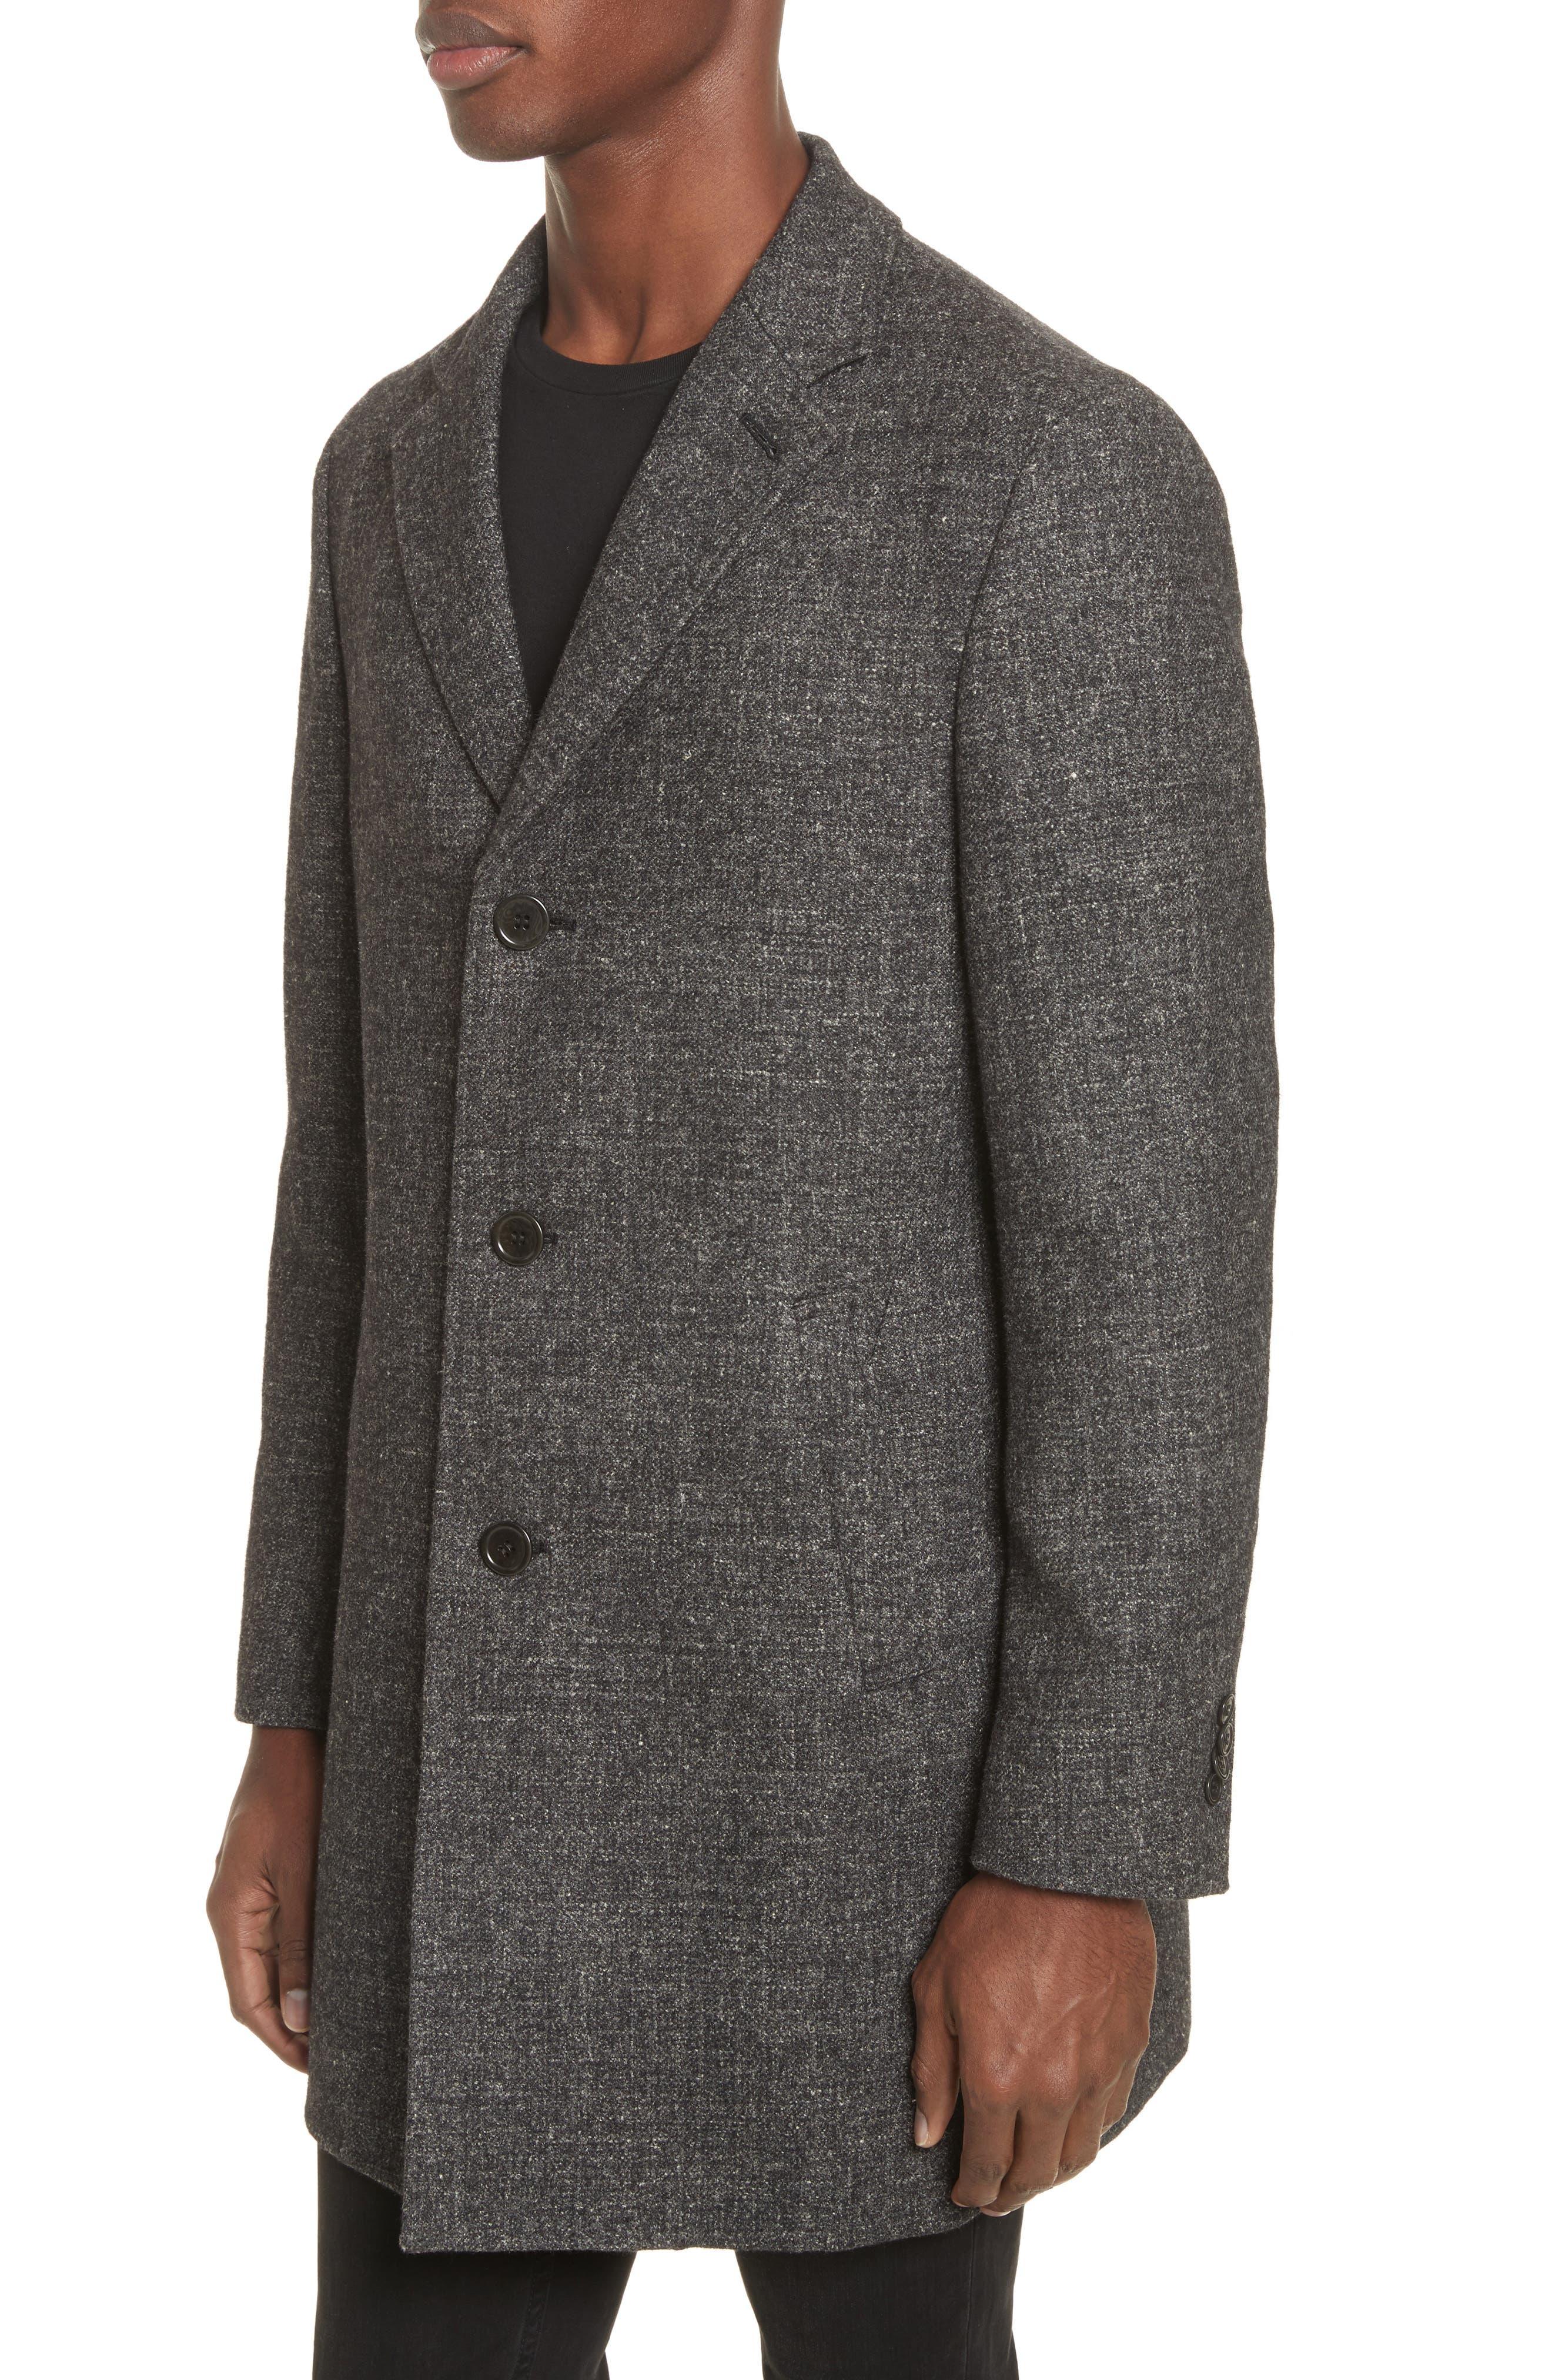 Walsh Wool & Linen Topcoat,                             Alternate thumbnail 4, color,                             Black/ Grey